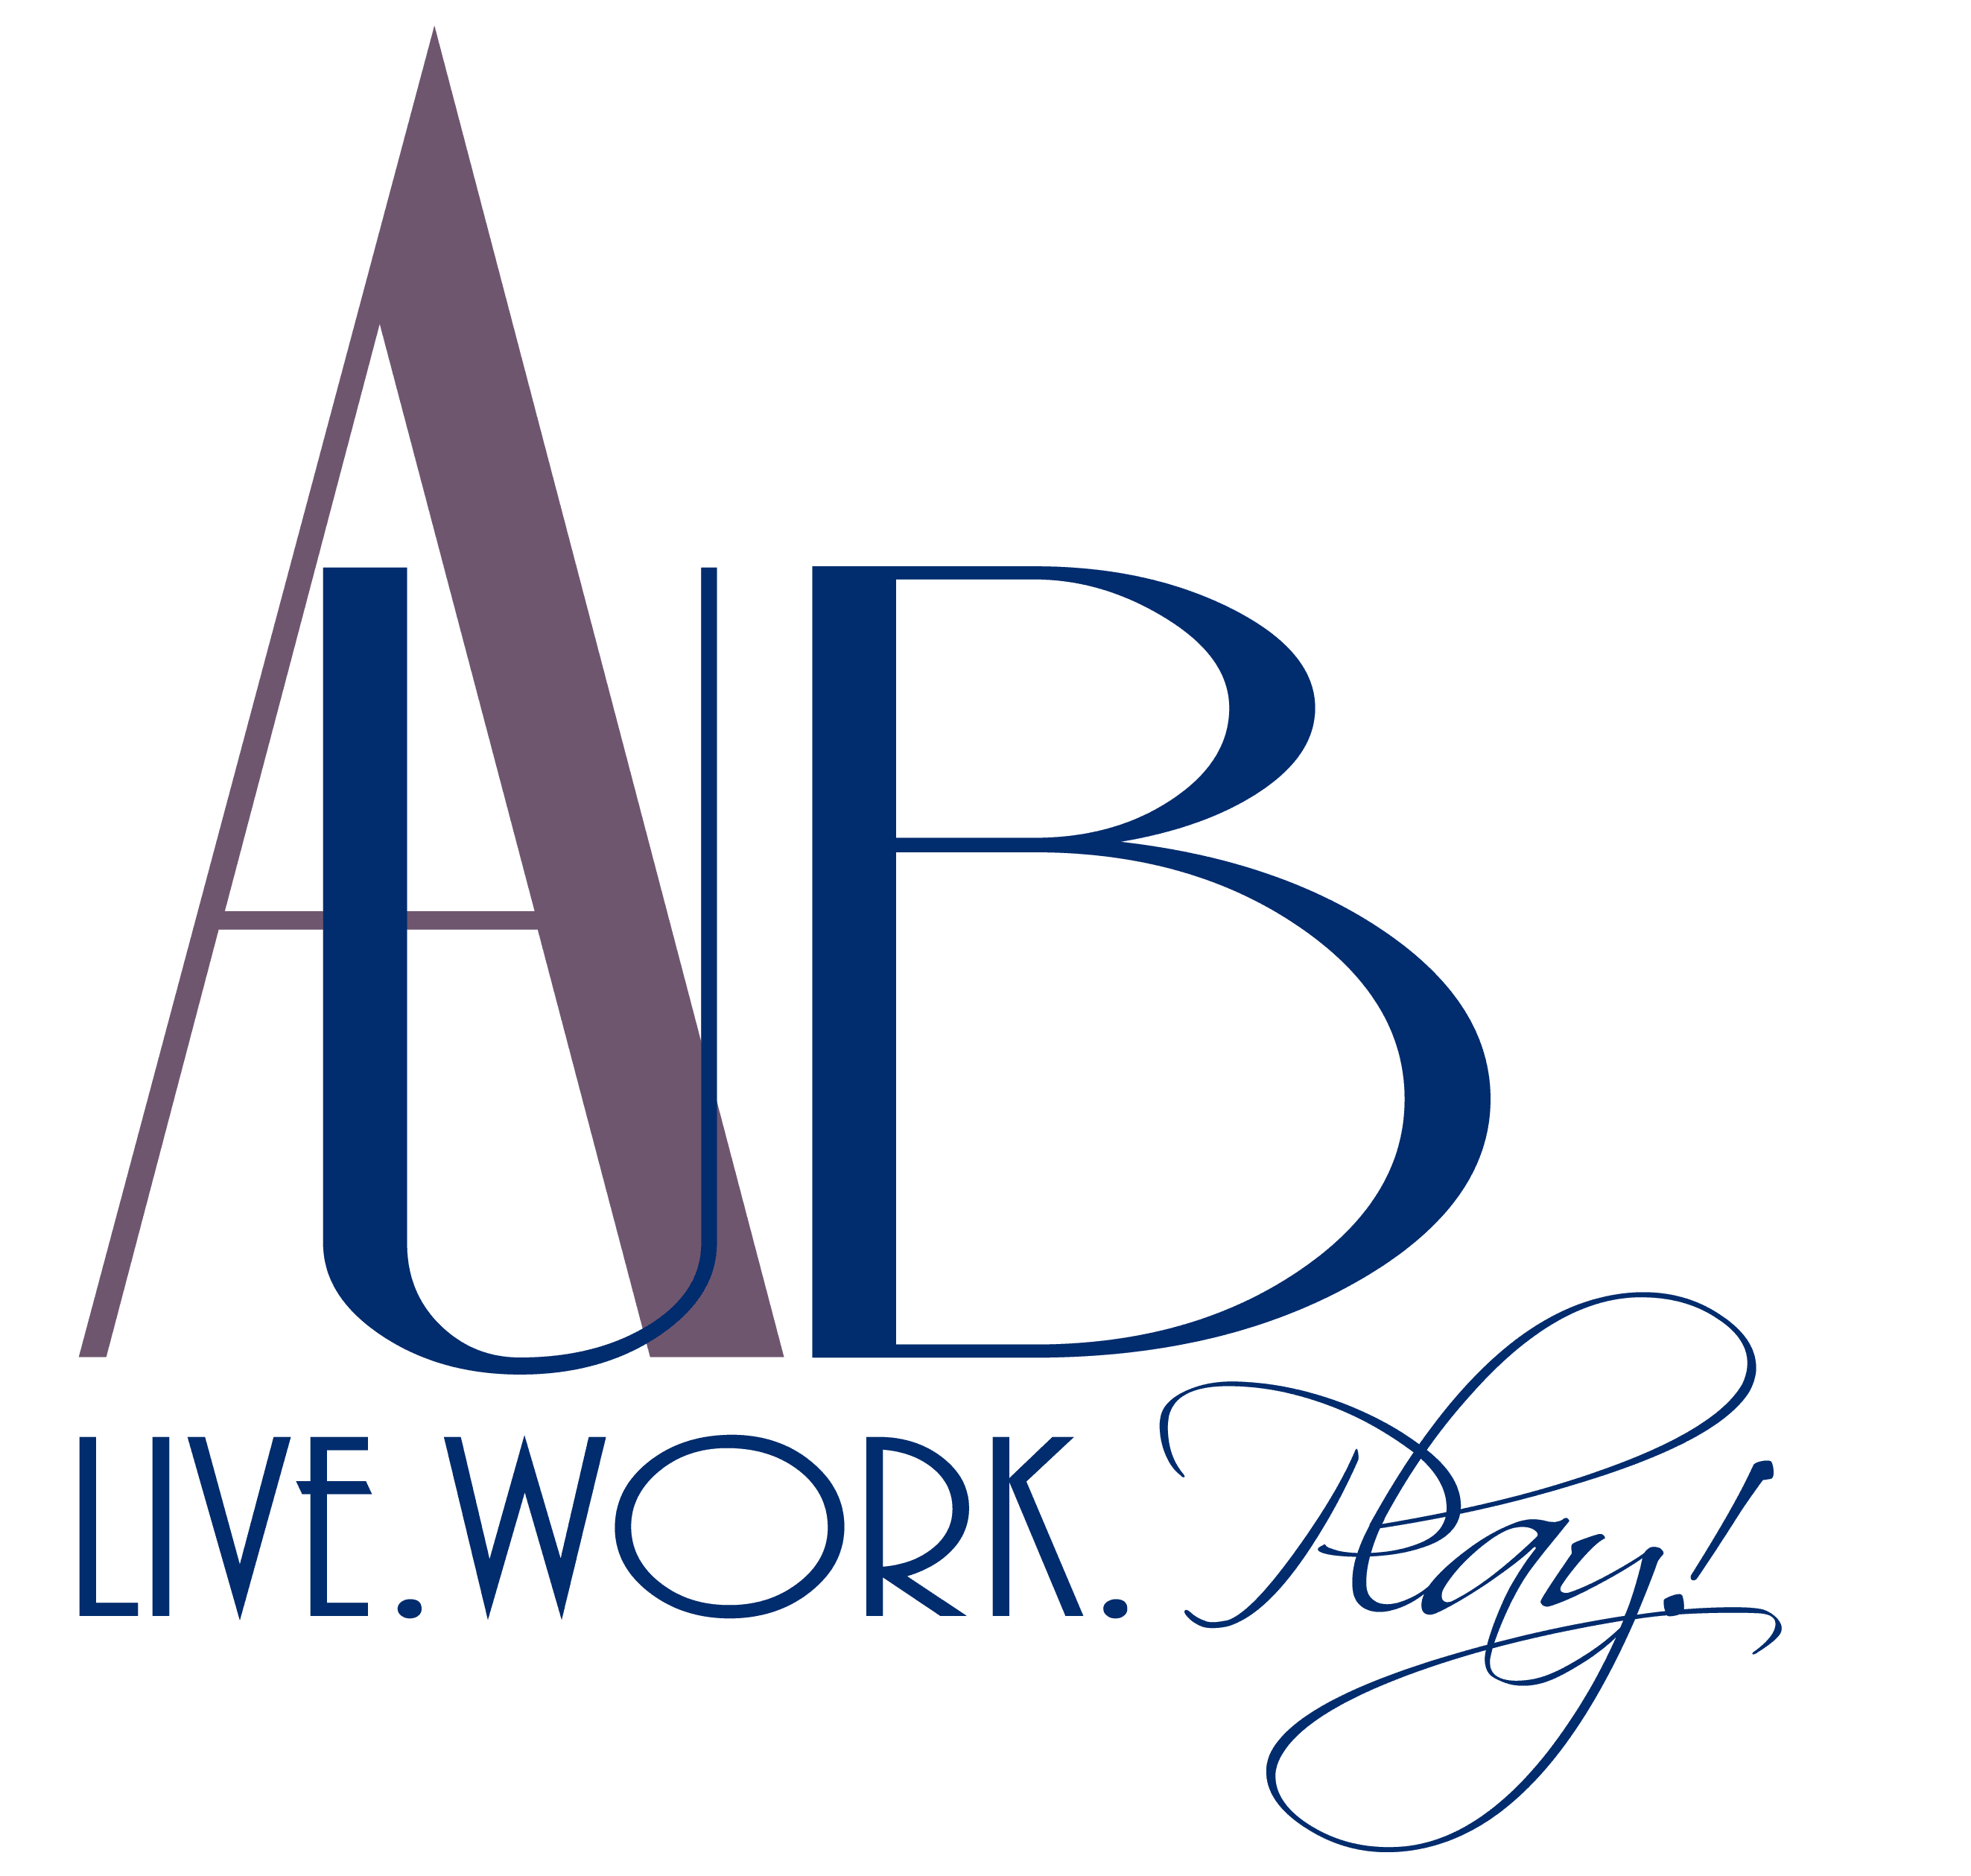 Addison logo AUB Live Work Play